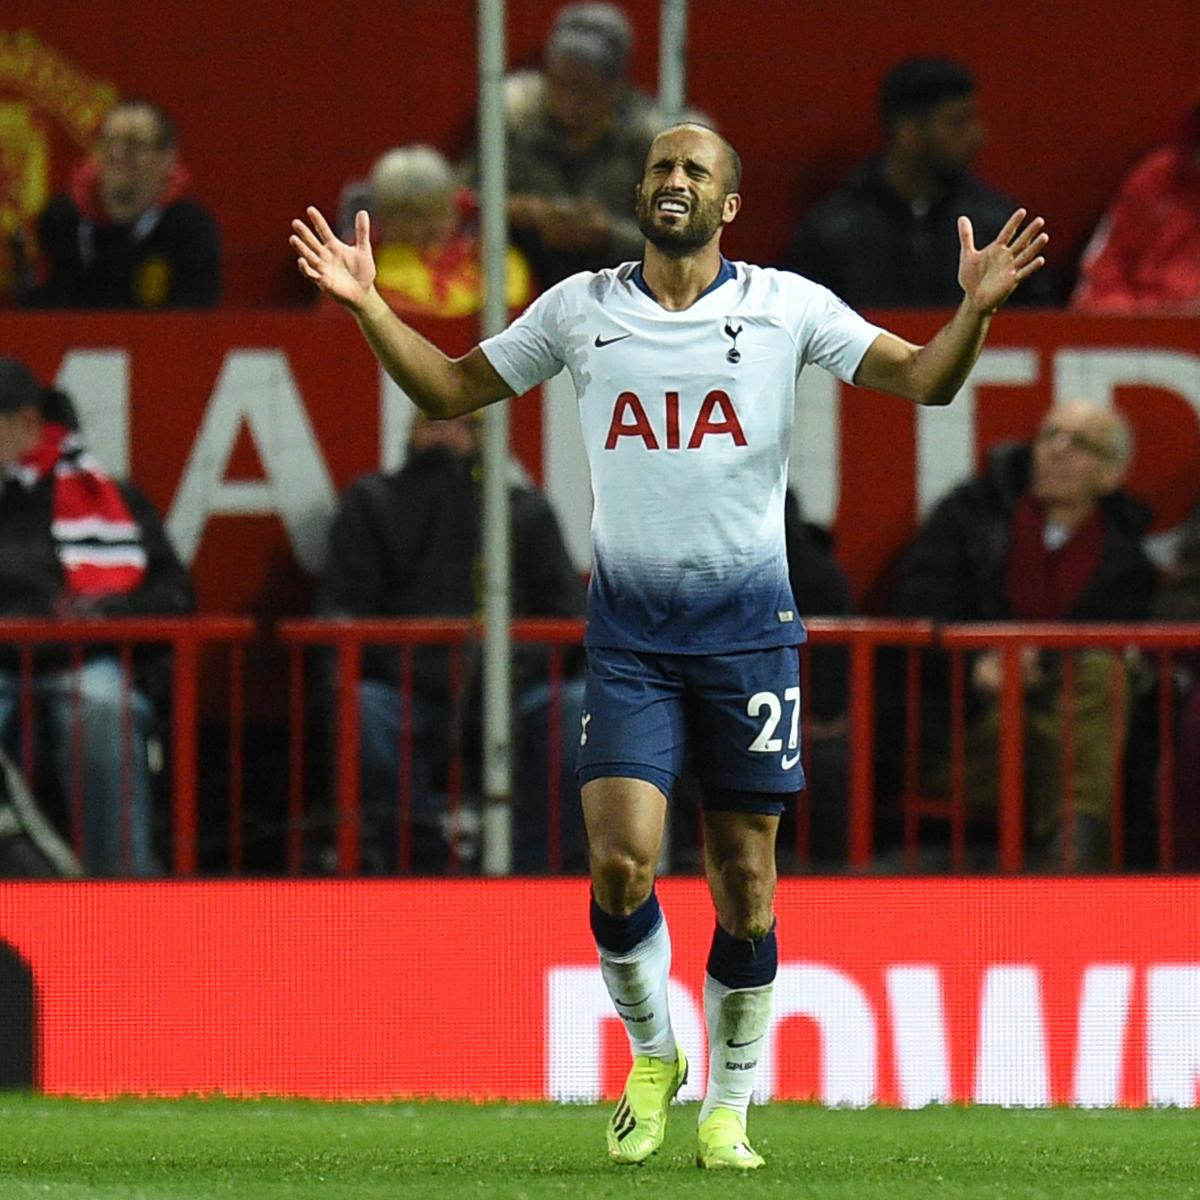 Lucas Moura Tottenham Highlights: Harry Kane, Tottenham Demolish Jose Mourinho, Manchester